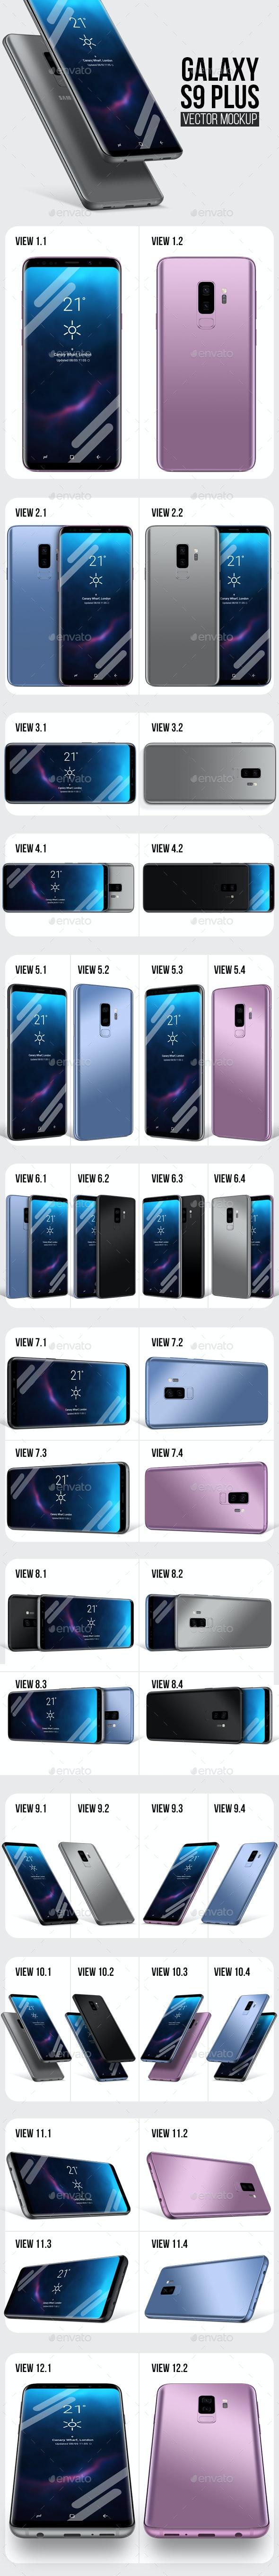 Galaxy S9 Plus Vector Mockup - Mobile Displays